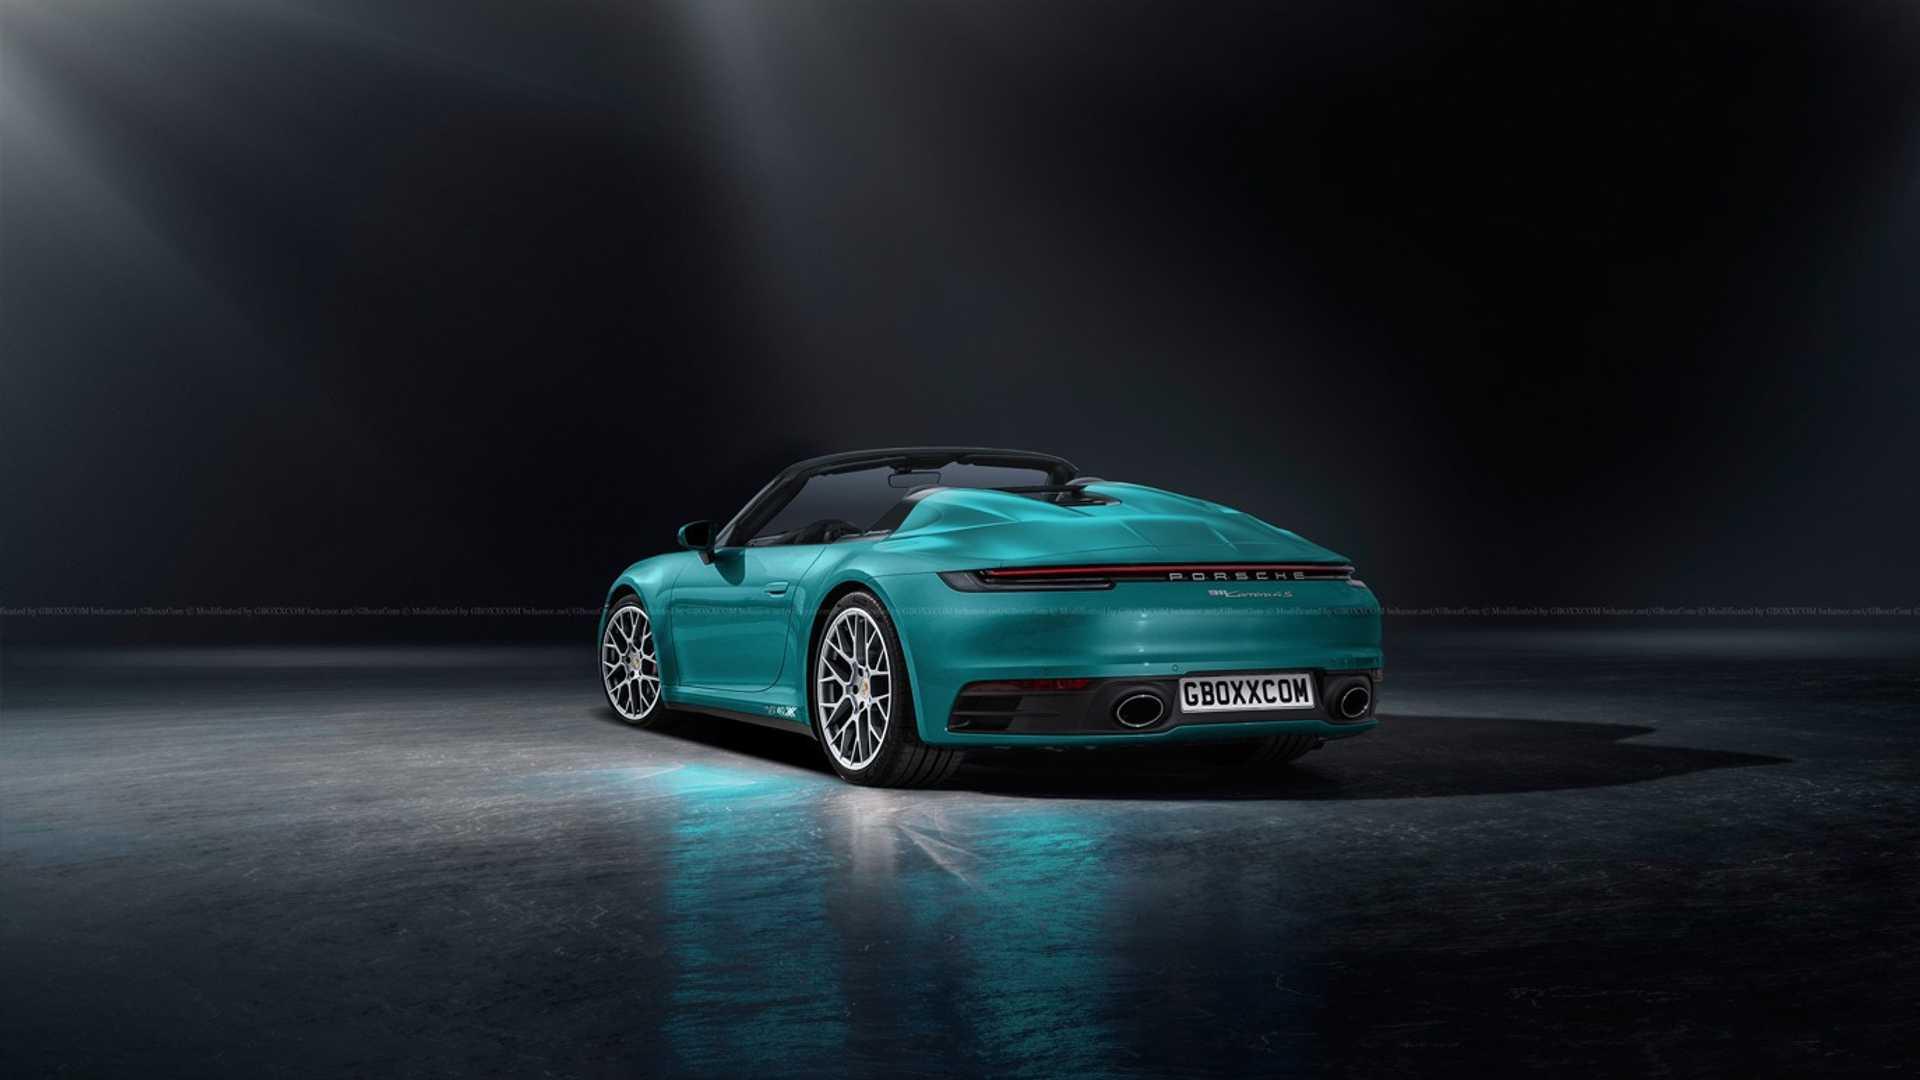 79 Best Review 2020 Porsche Speedster Rumors for 2020 Porsche Speedster